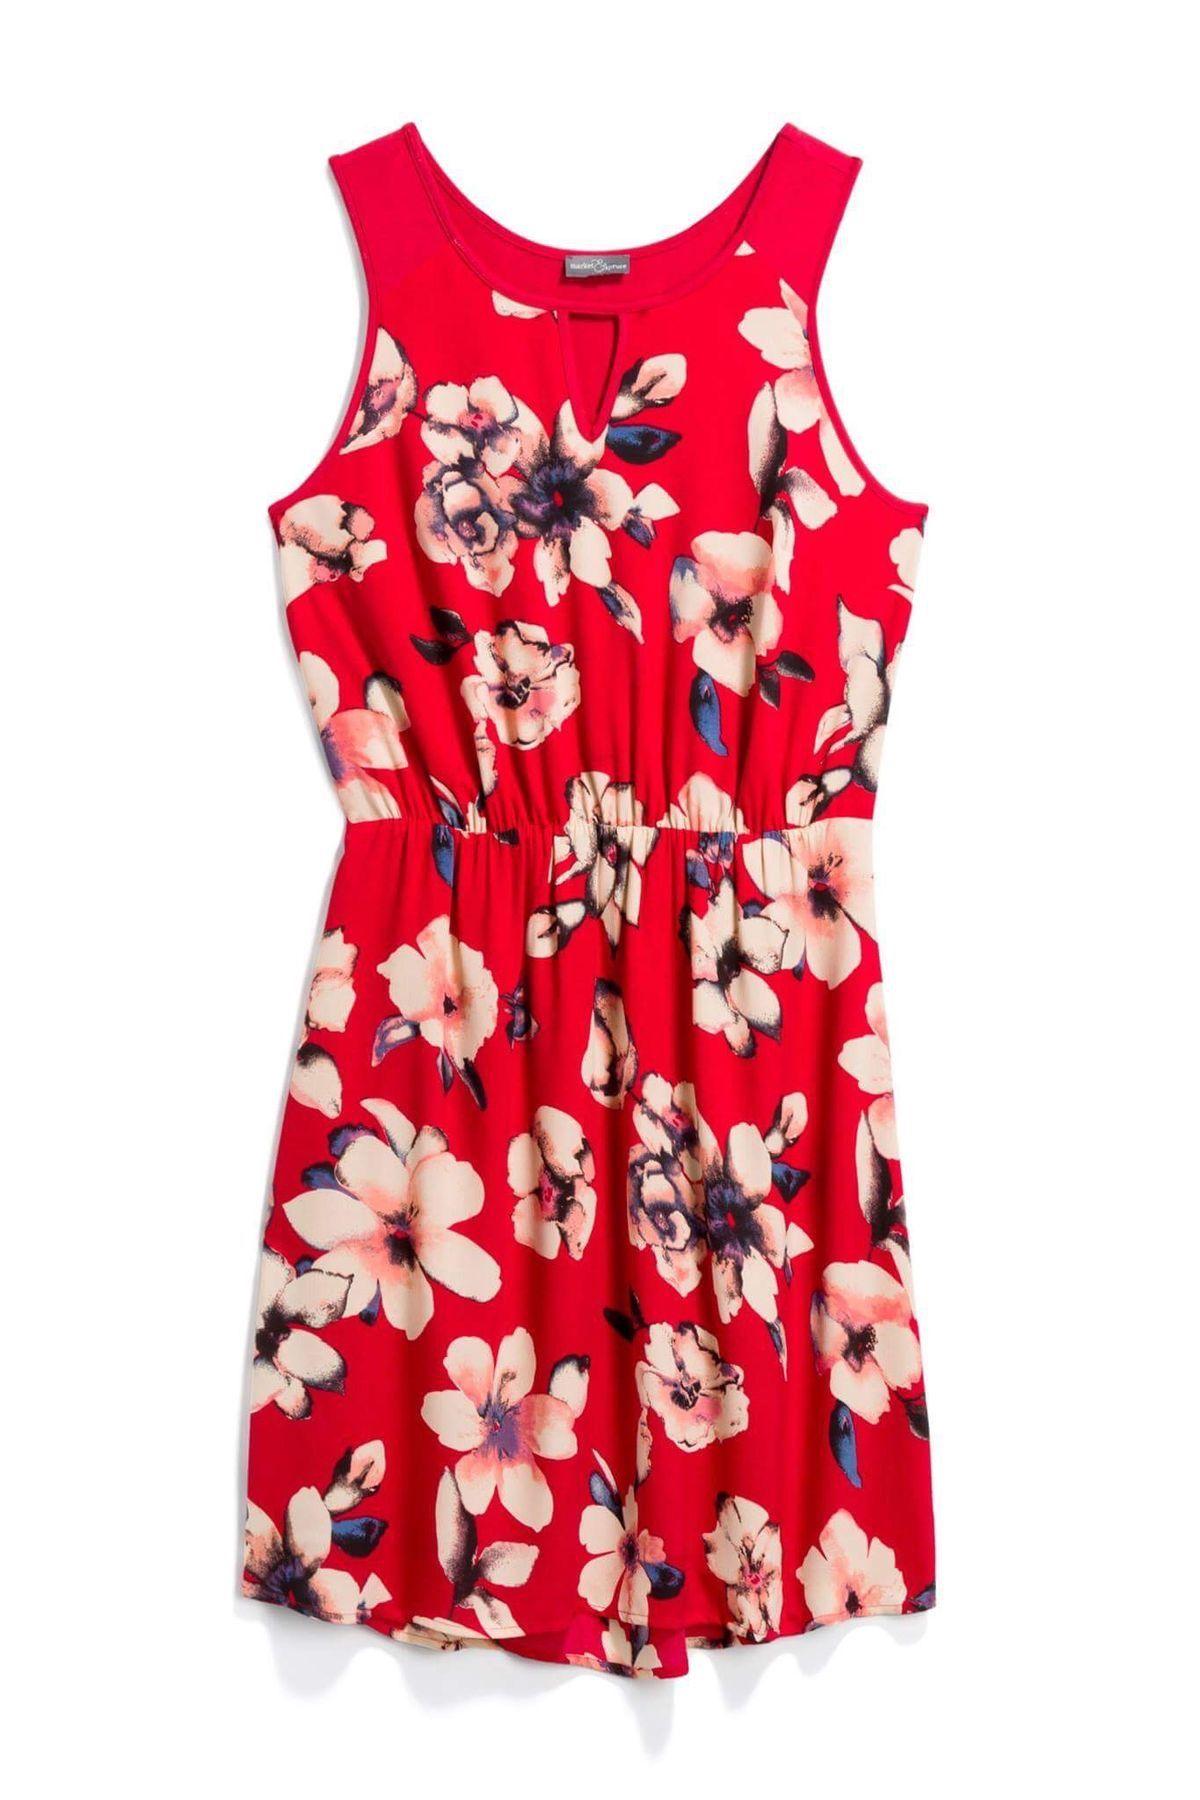 Market u spruce red floral dress stitch fix style quiz